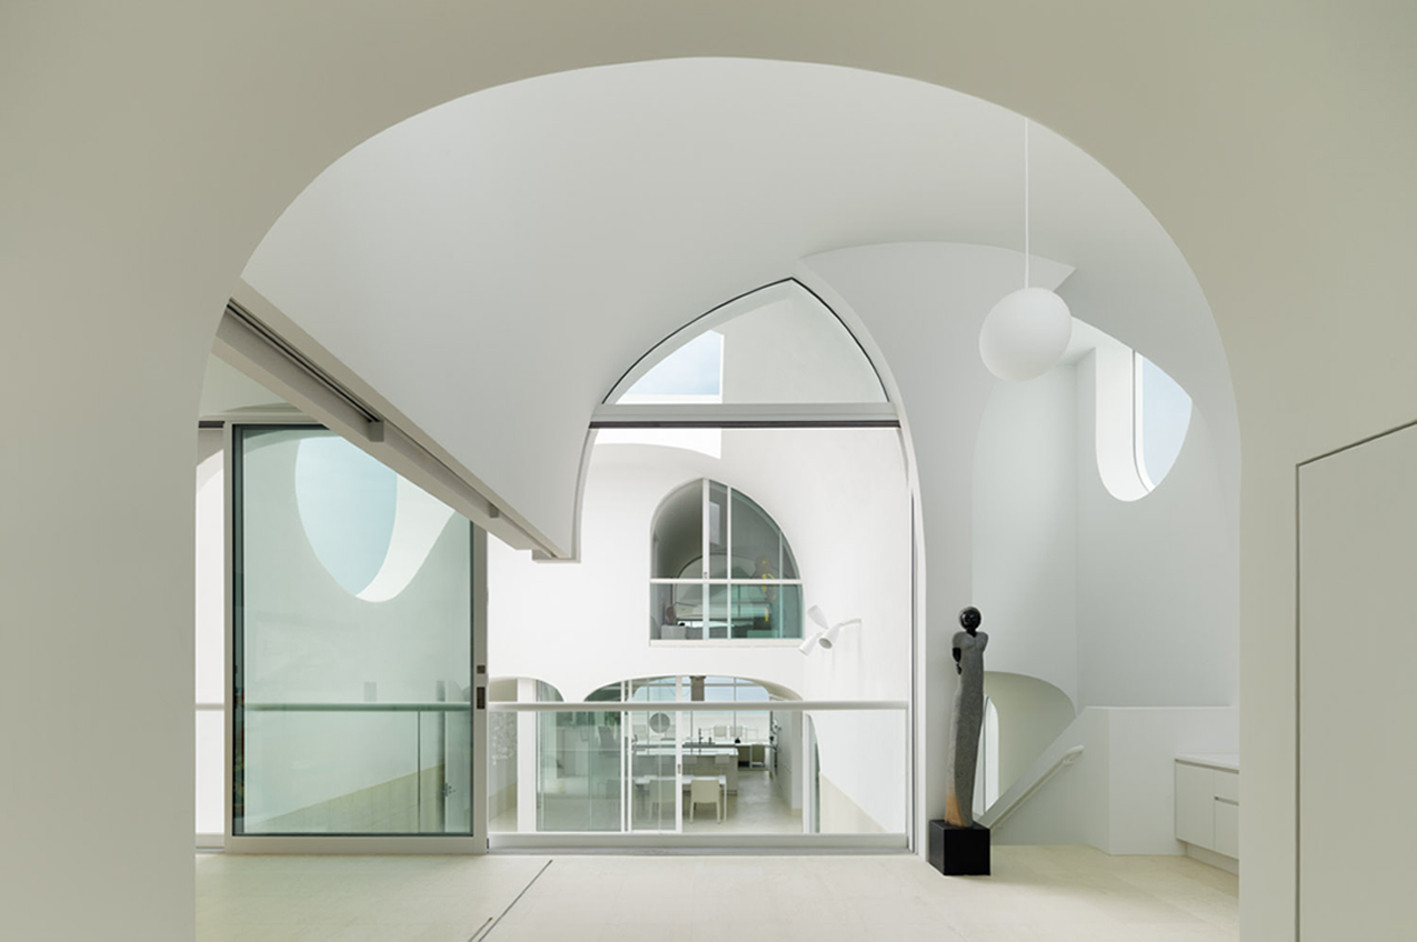 Outstanding Gallery Of Vault House Johnston Marklee 7 Download Free Architecture Designs Scobabritishbridgeorg